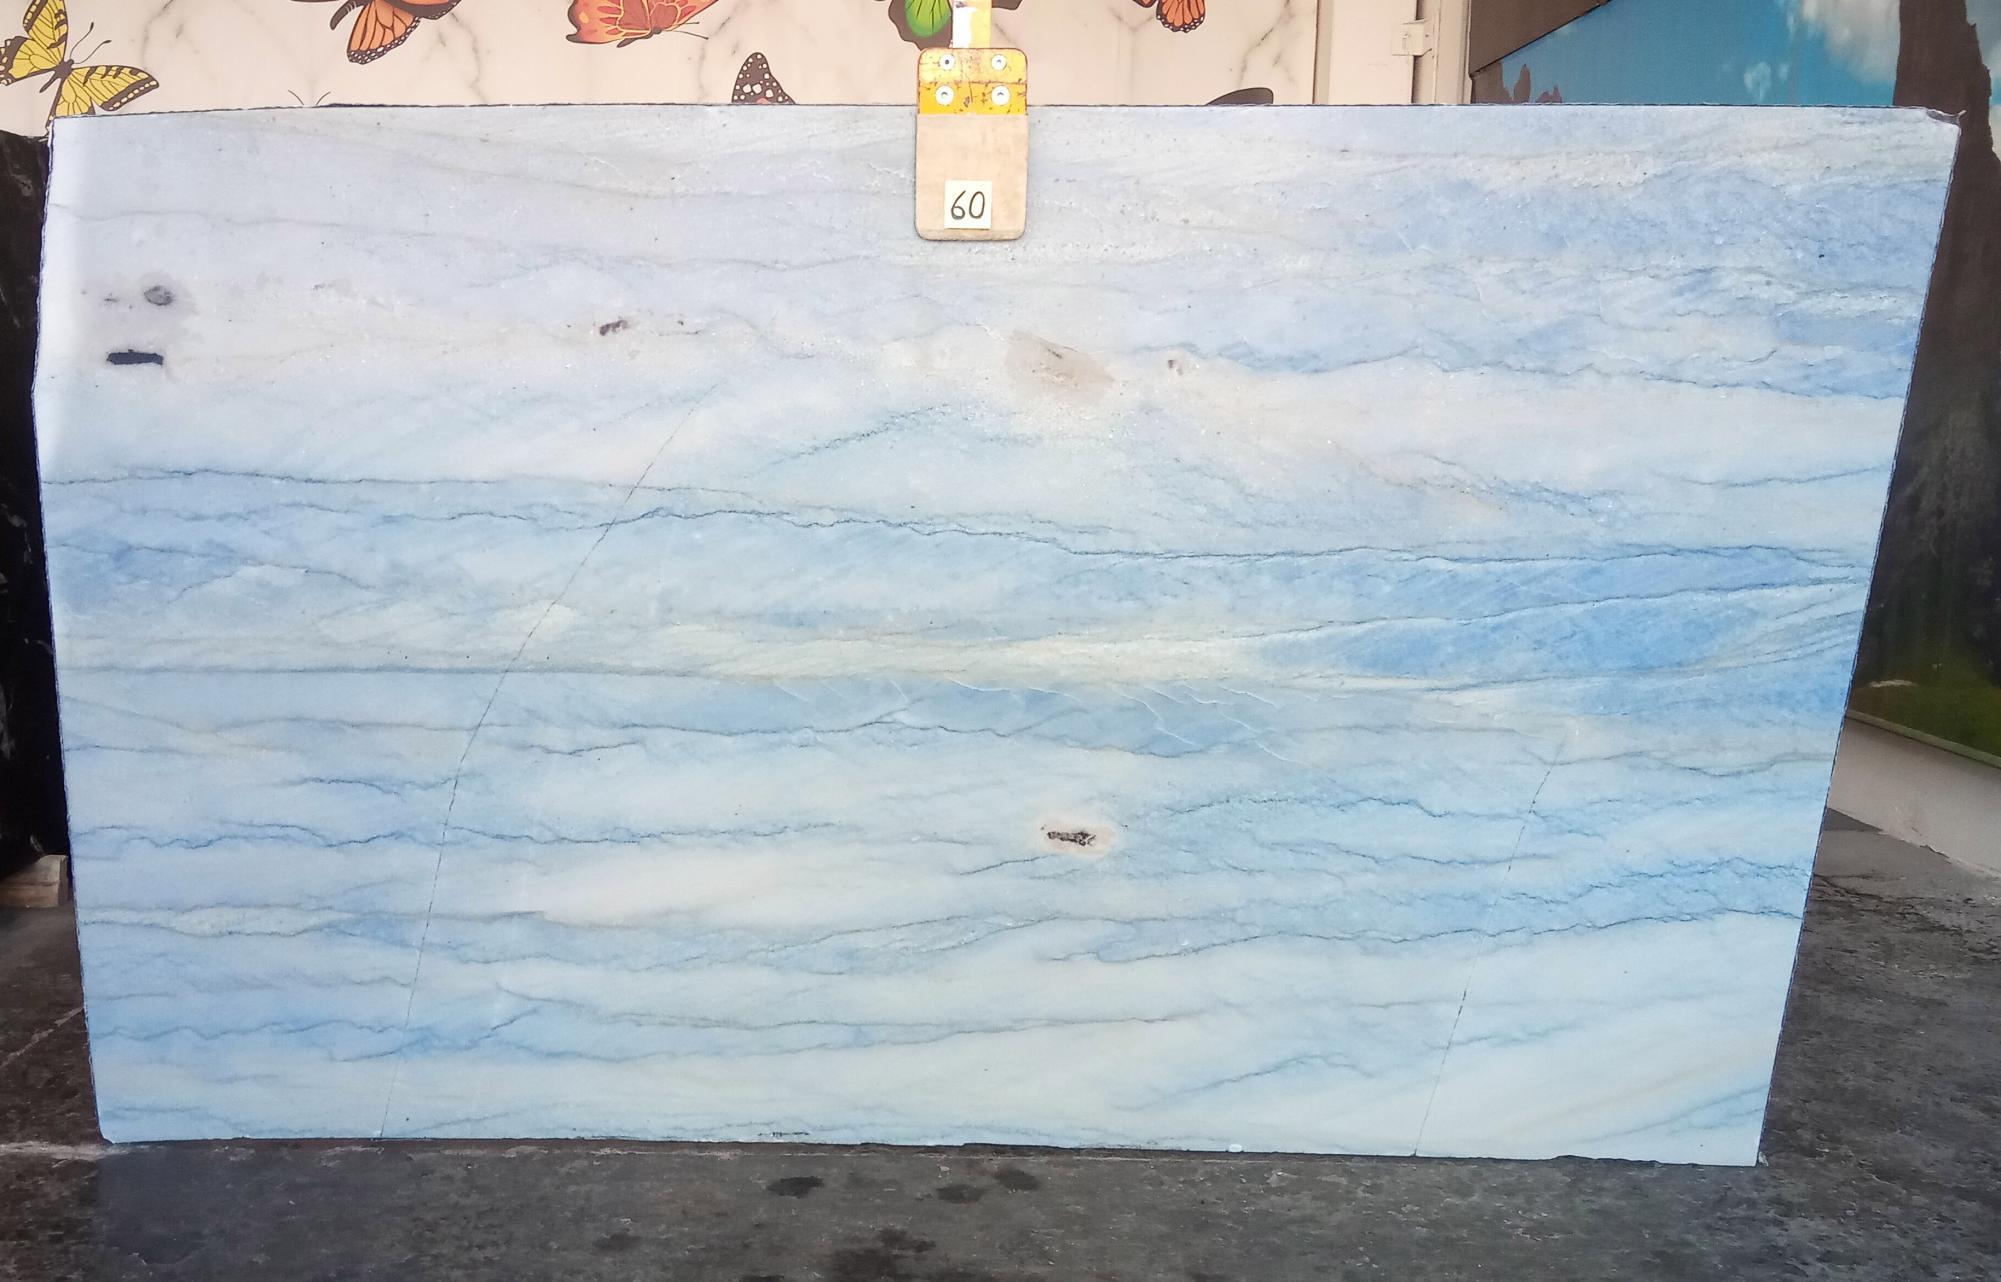 AZUL MAKAUBA polierte Unmaßplatten Z0191 aus Natur Marmor , Slab #60: Lieferung Veneto, Italien